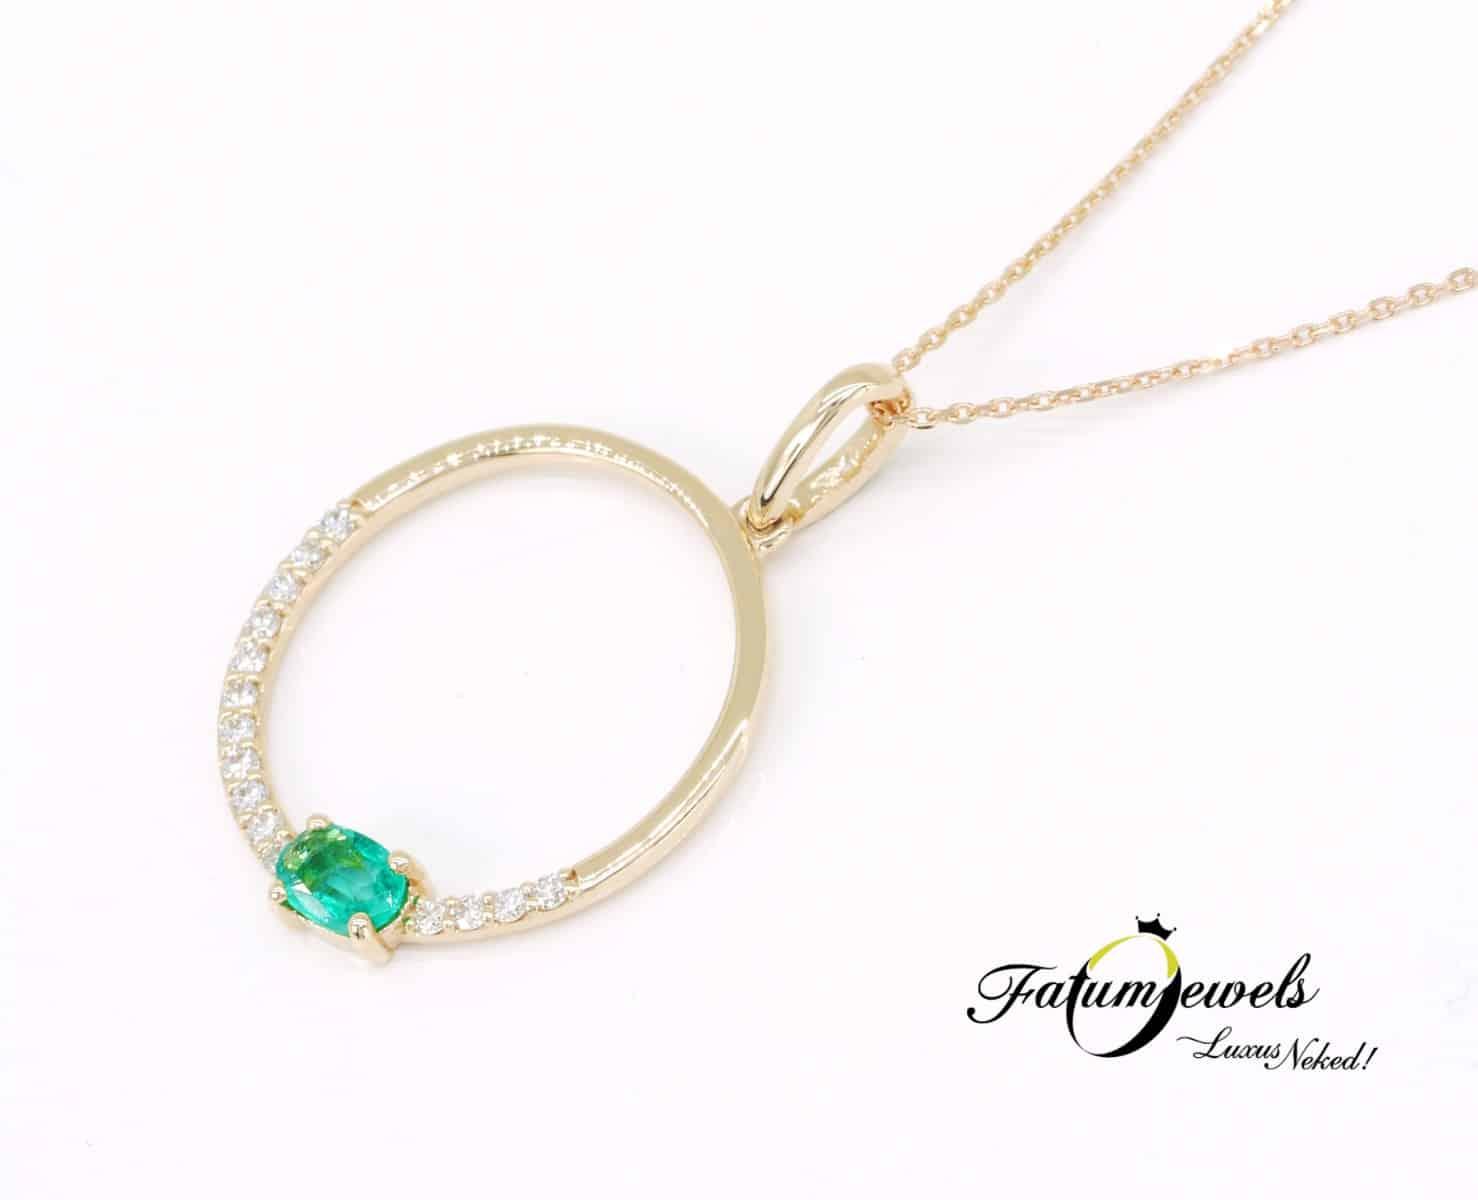 rose-arany-gyemant-smaragd-medal-orakulum-fr252-0-10ct-w-vs2-smaragd-0-13ct-li-14k-1